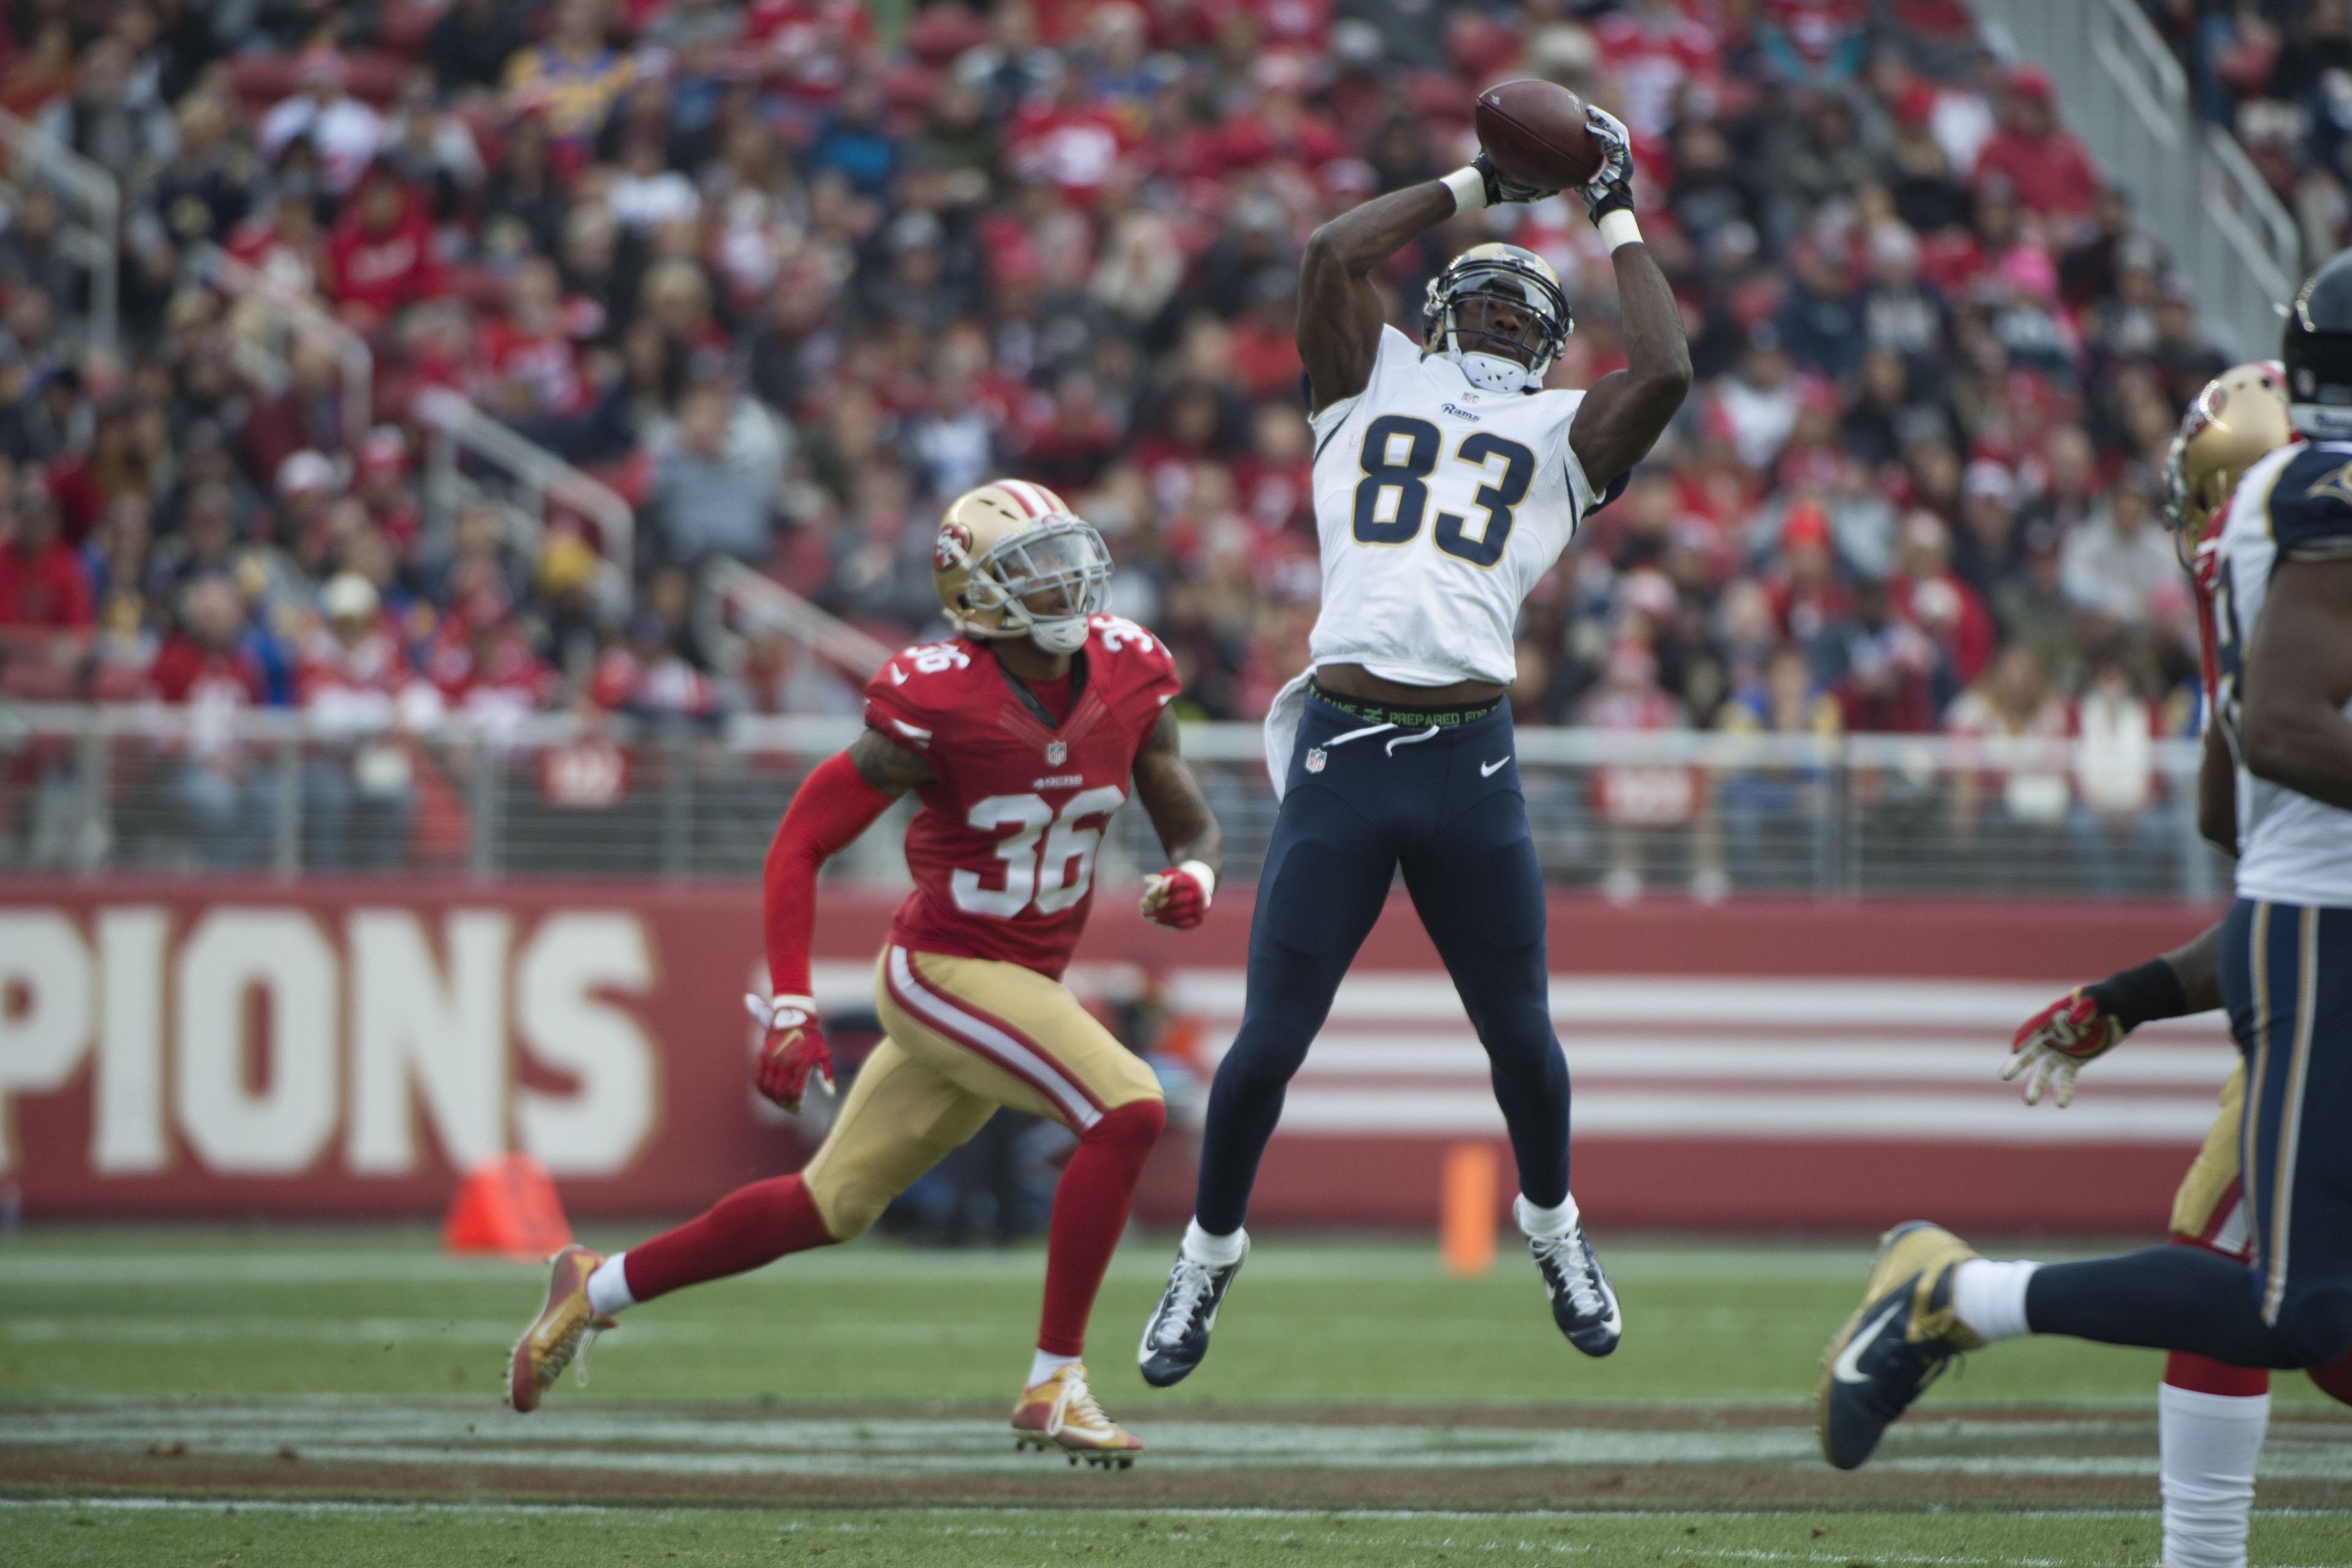 NFL: St. Louis Rams at San Francisco 49ers